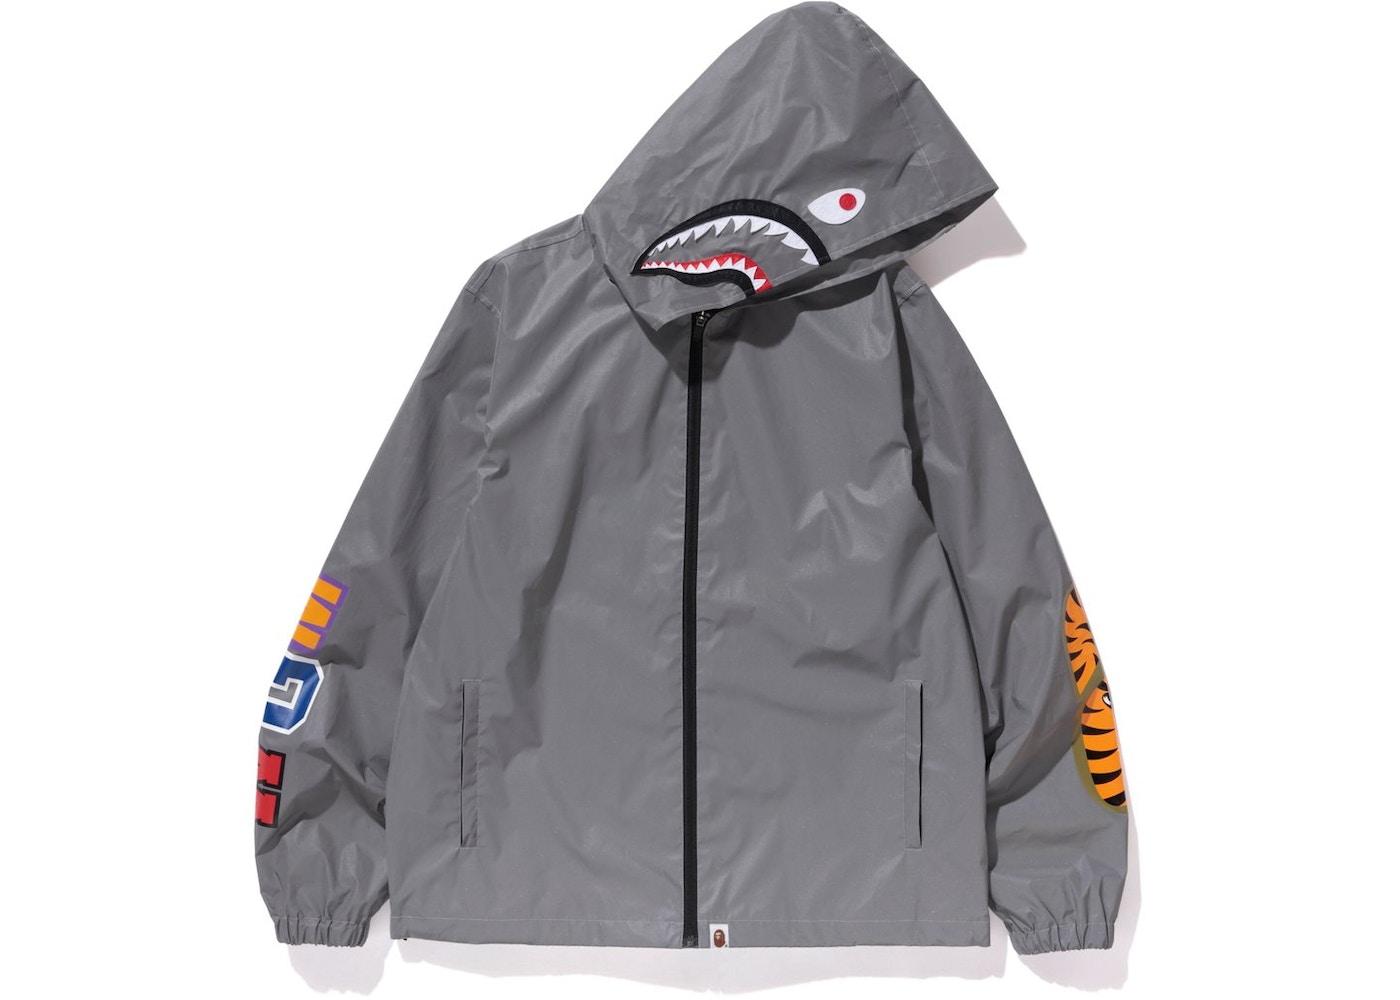 bda0d26c41a1 BAPE Reflector Shark Hoodie Jacket Silver -